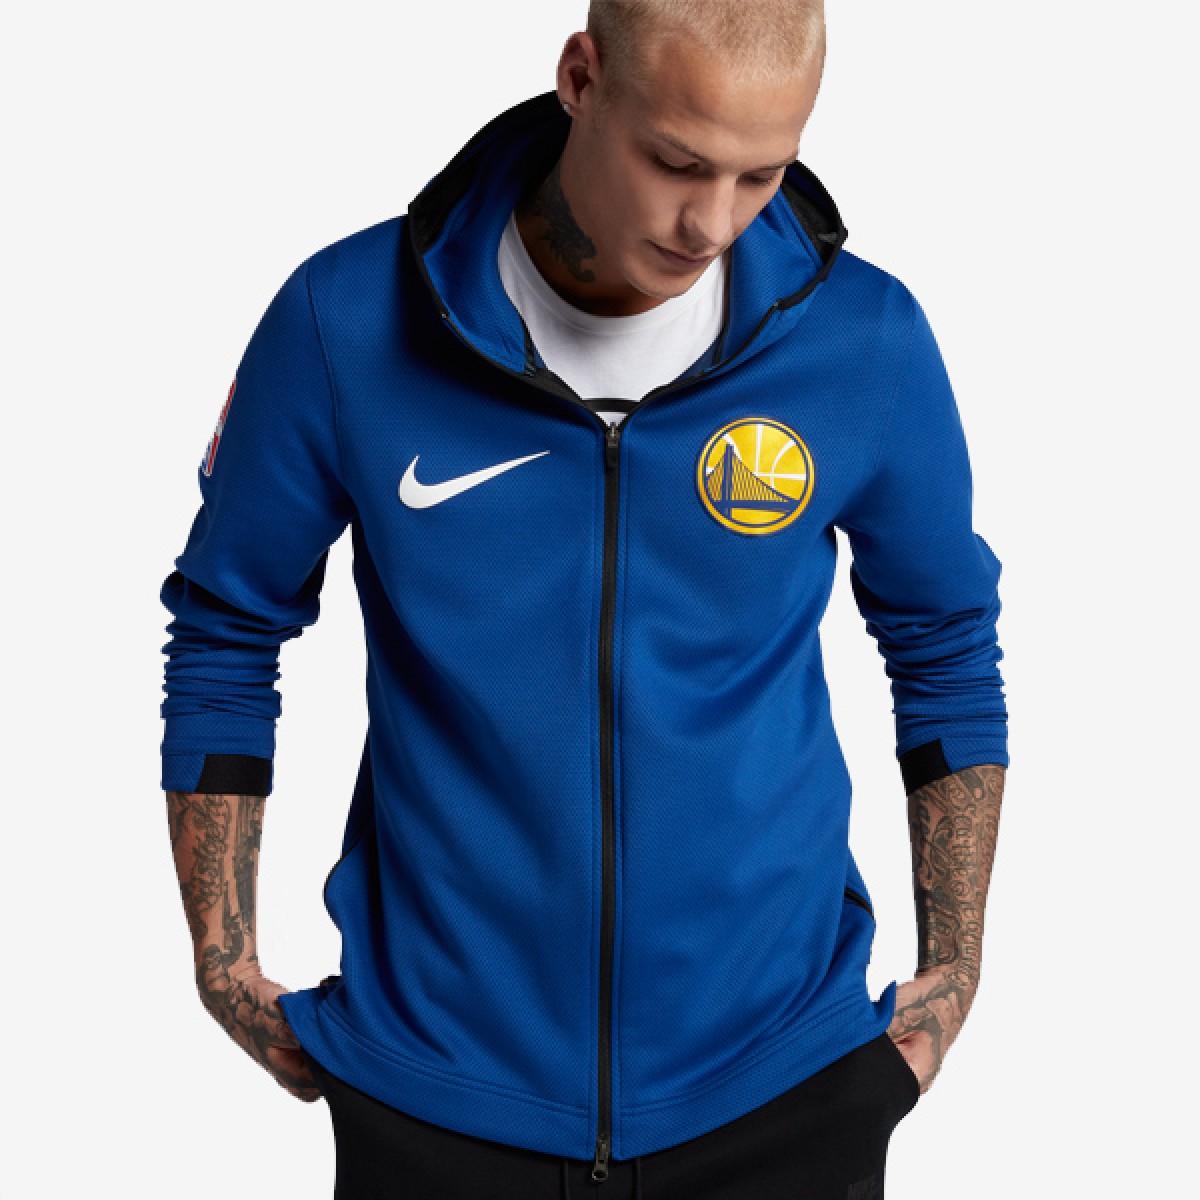 Nike NBA GSW Thermaflex Showtime 'Icon Edition'